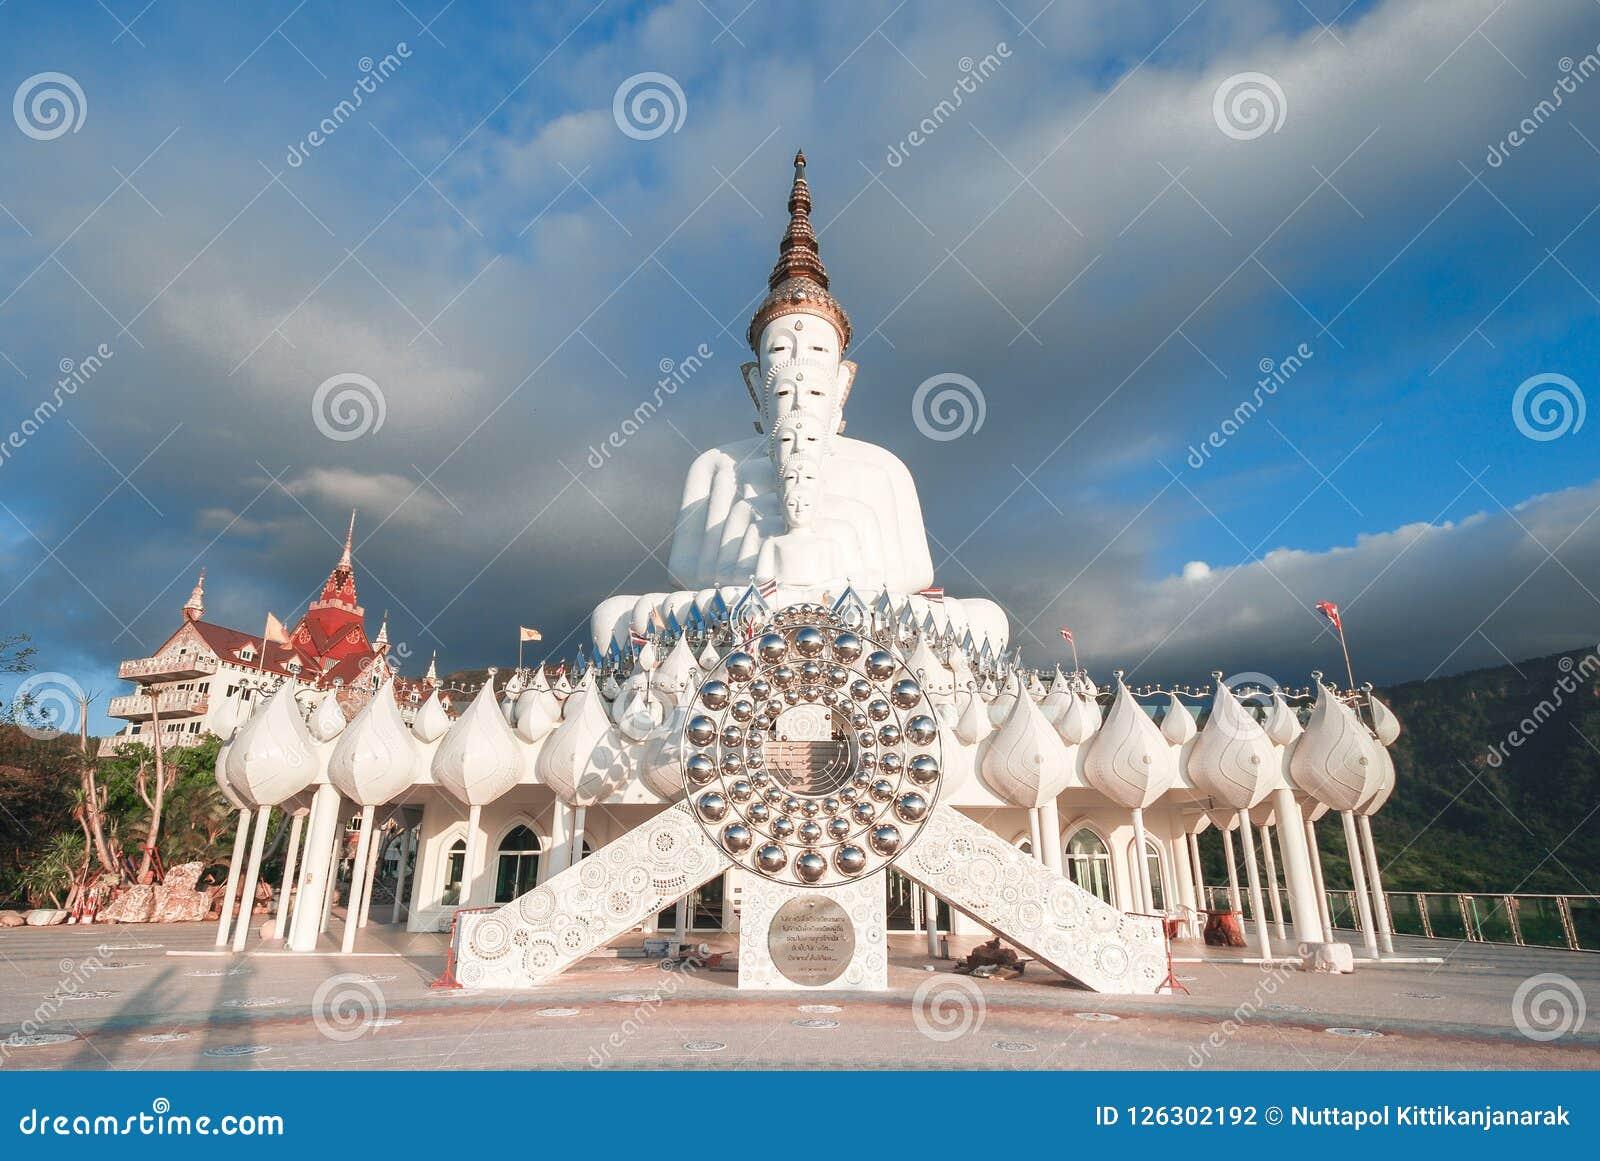 Five white buddha statue at Wat Phra Thart Pha Kaew, Thailand